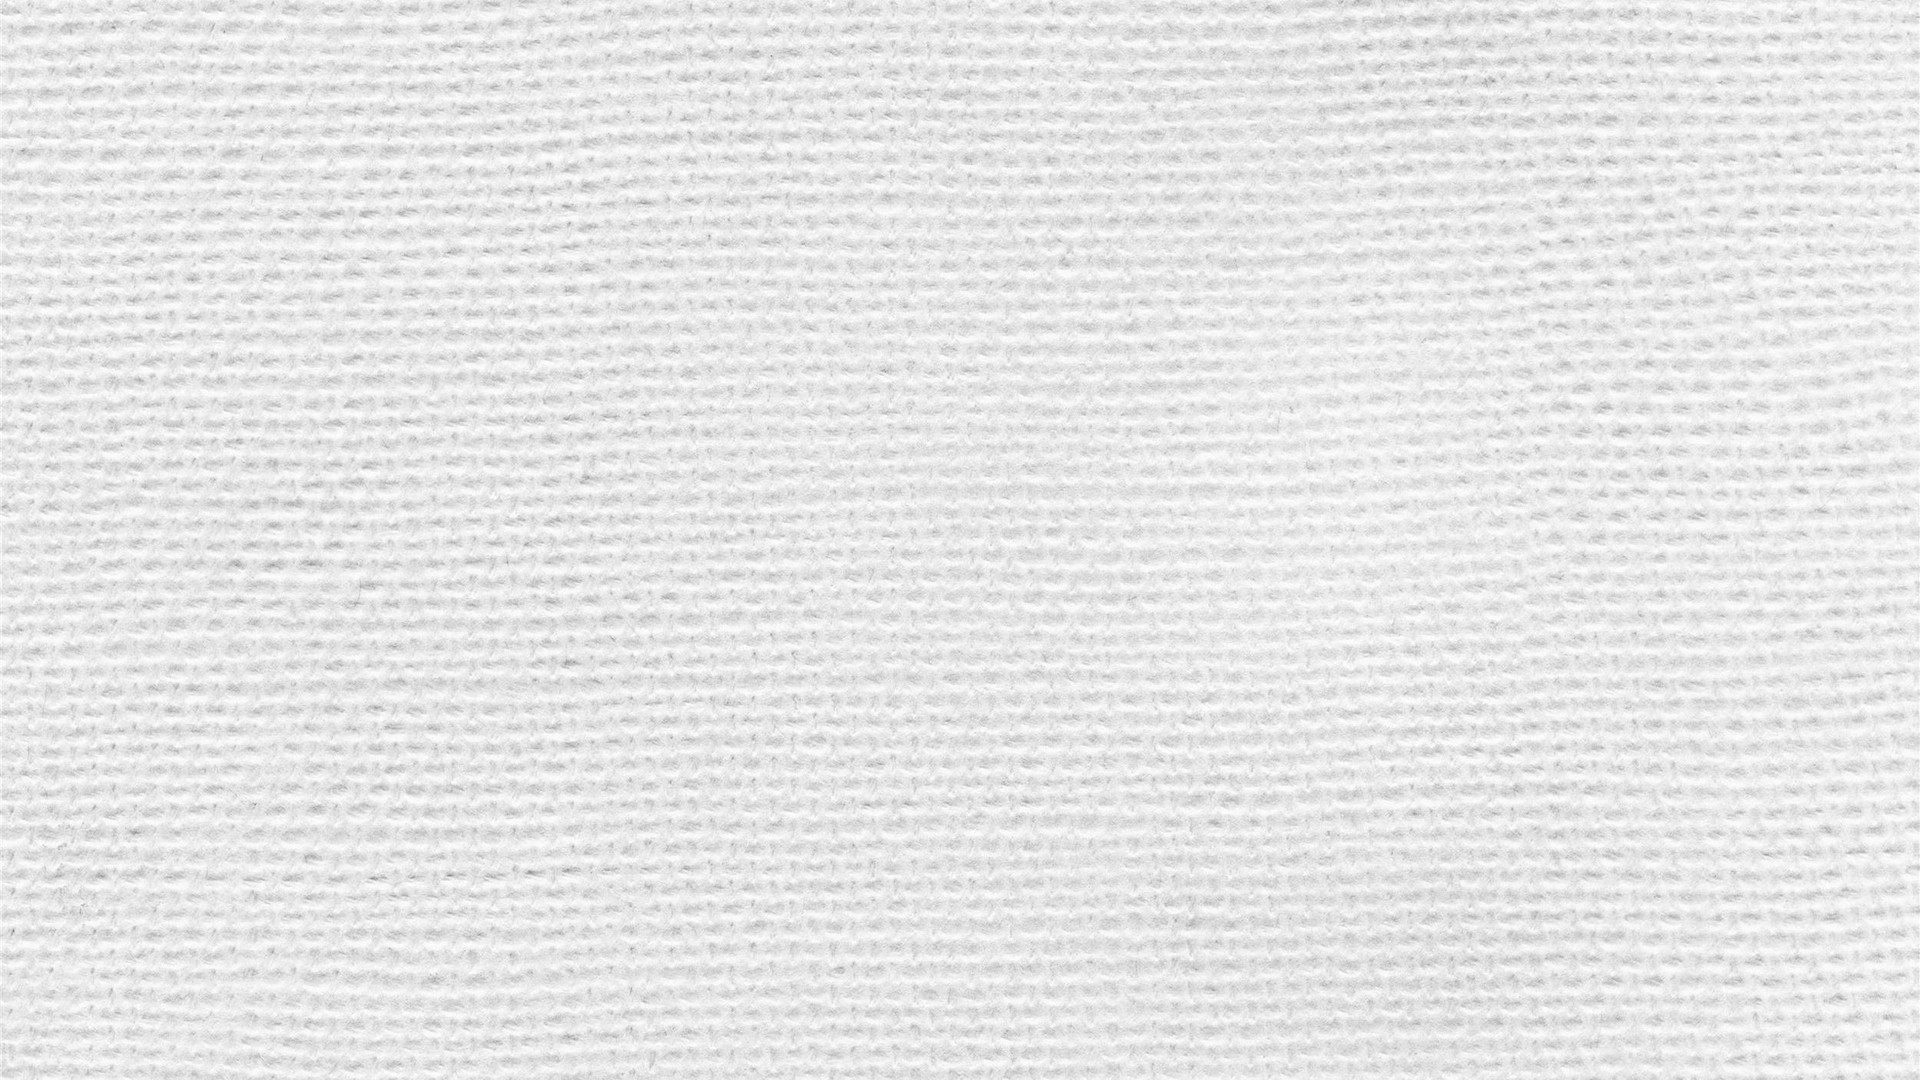 Canvas 1080p picture